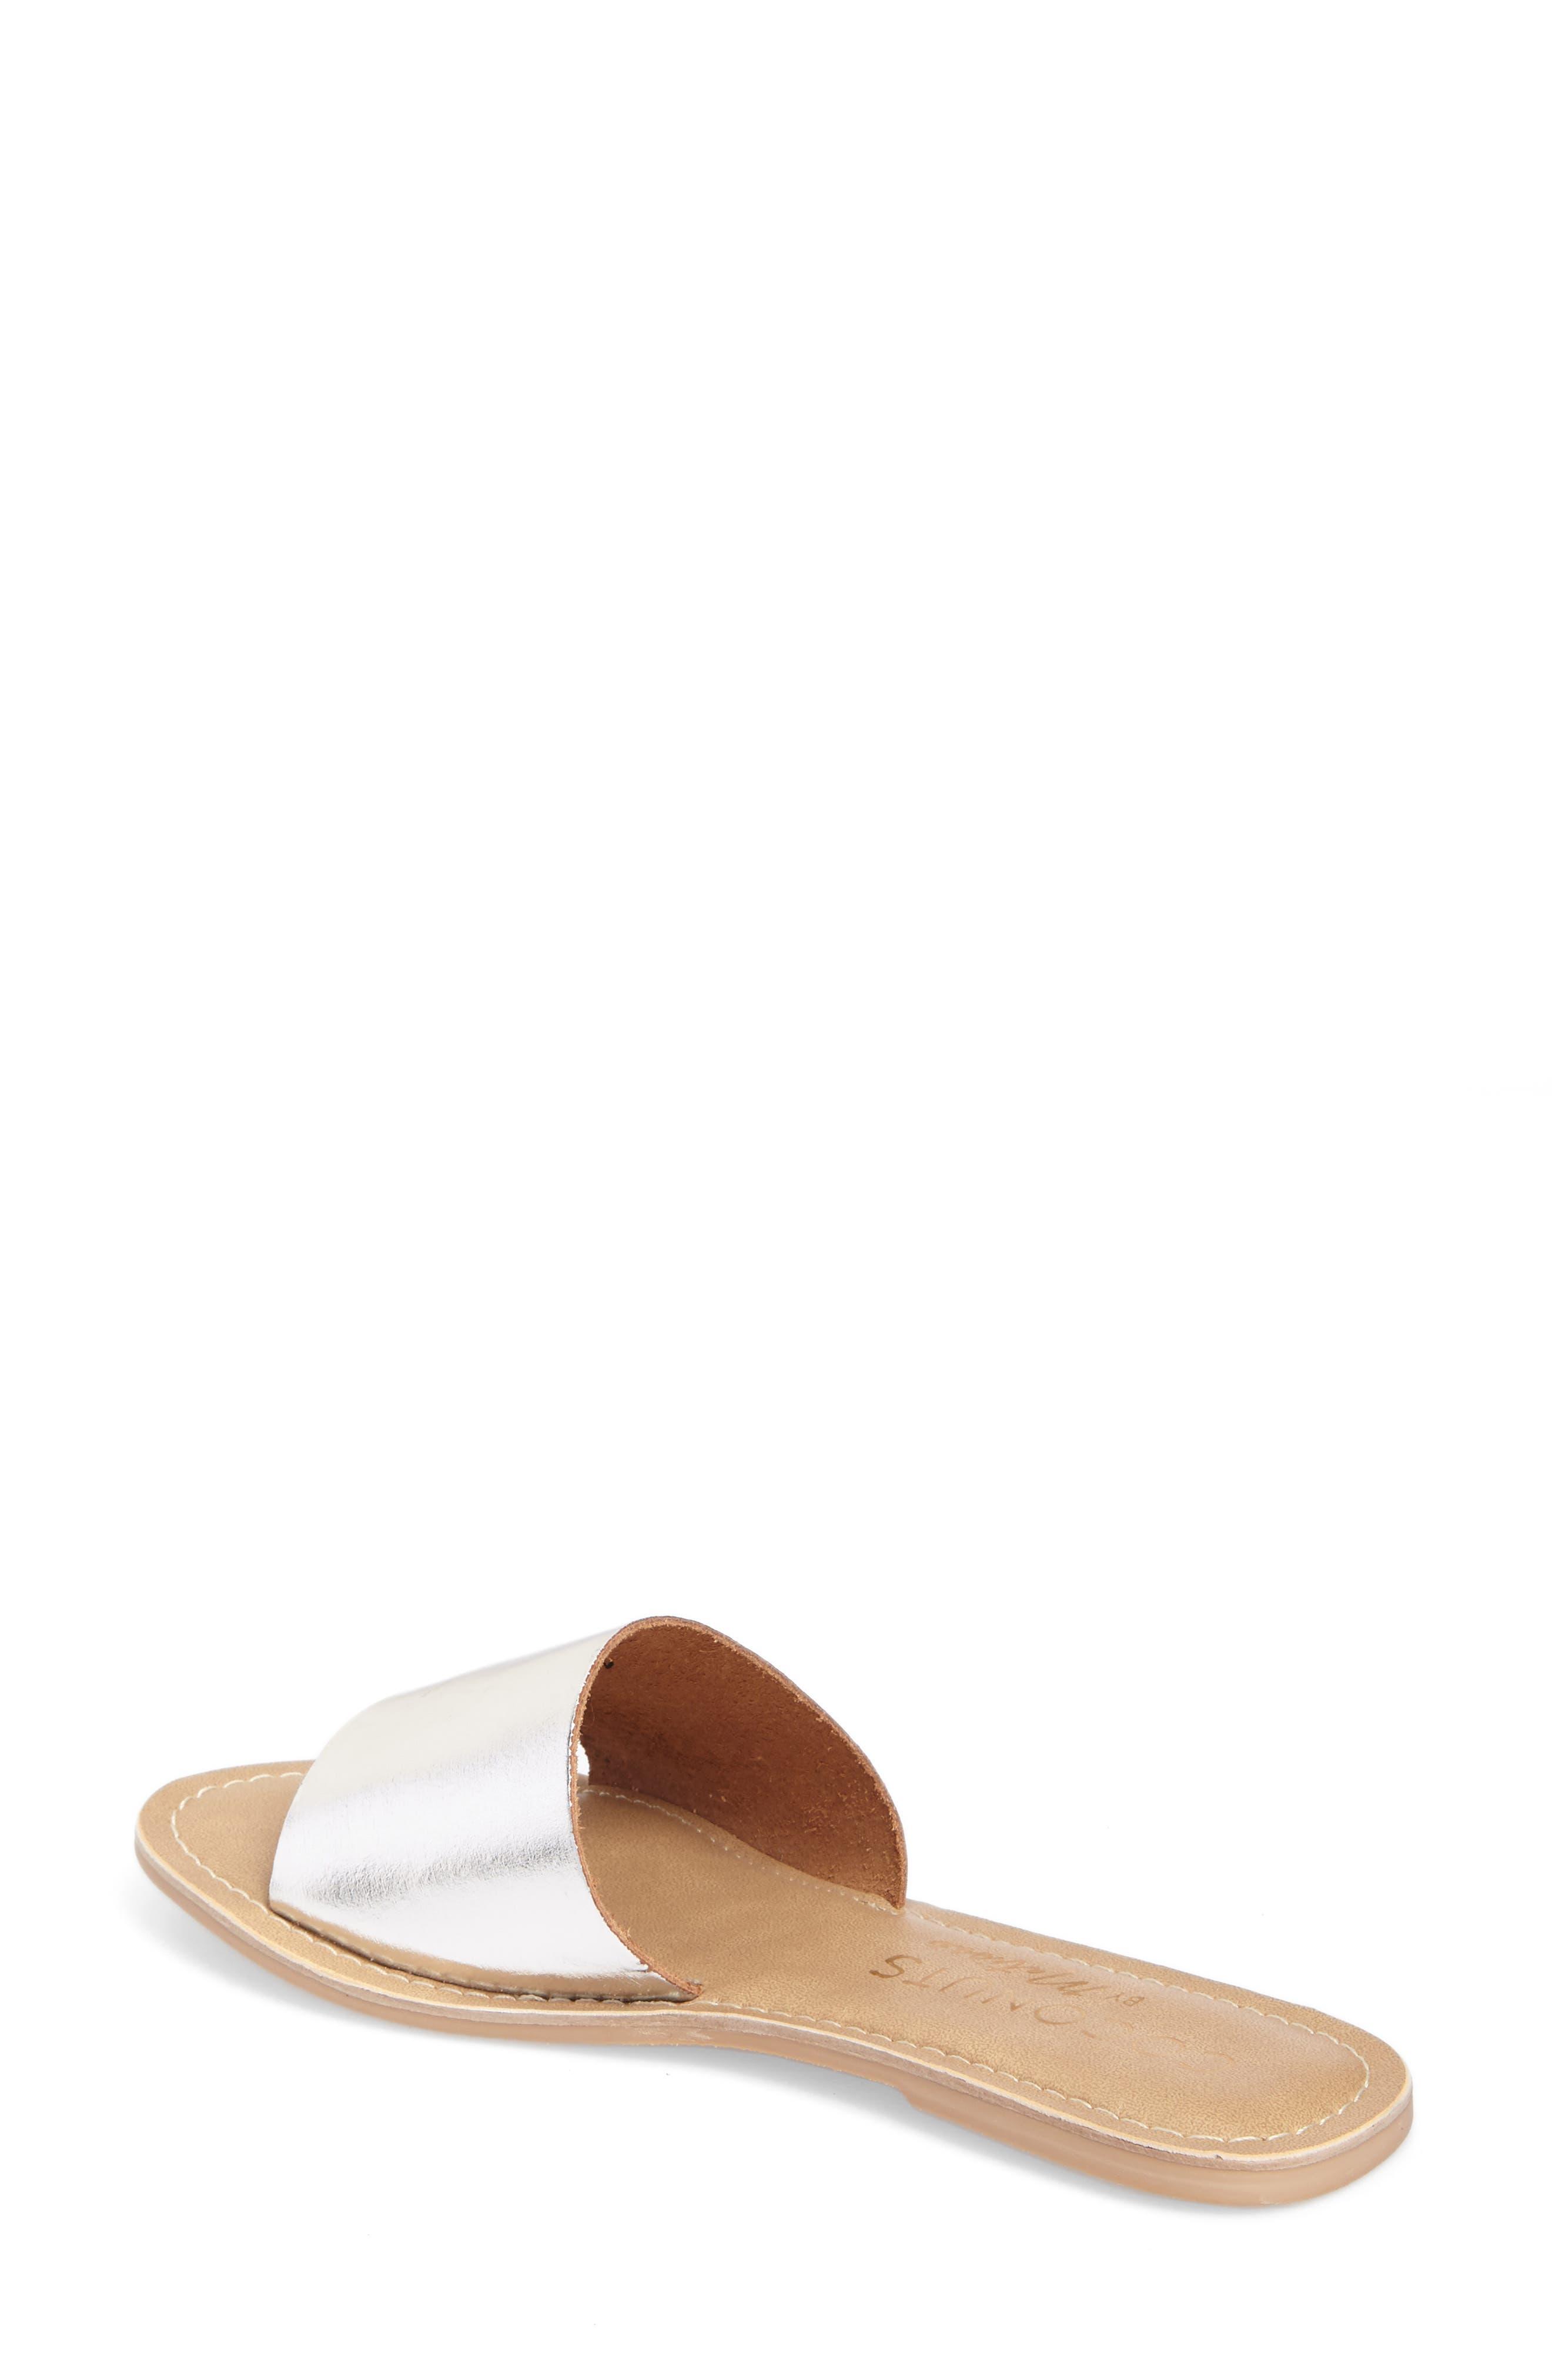 Cabana Slide Sandal,                             Alternate thumbnail 2, color,                             Silver Leather